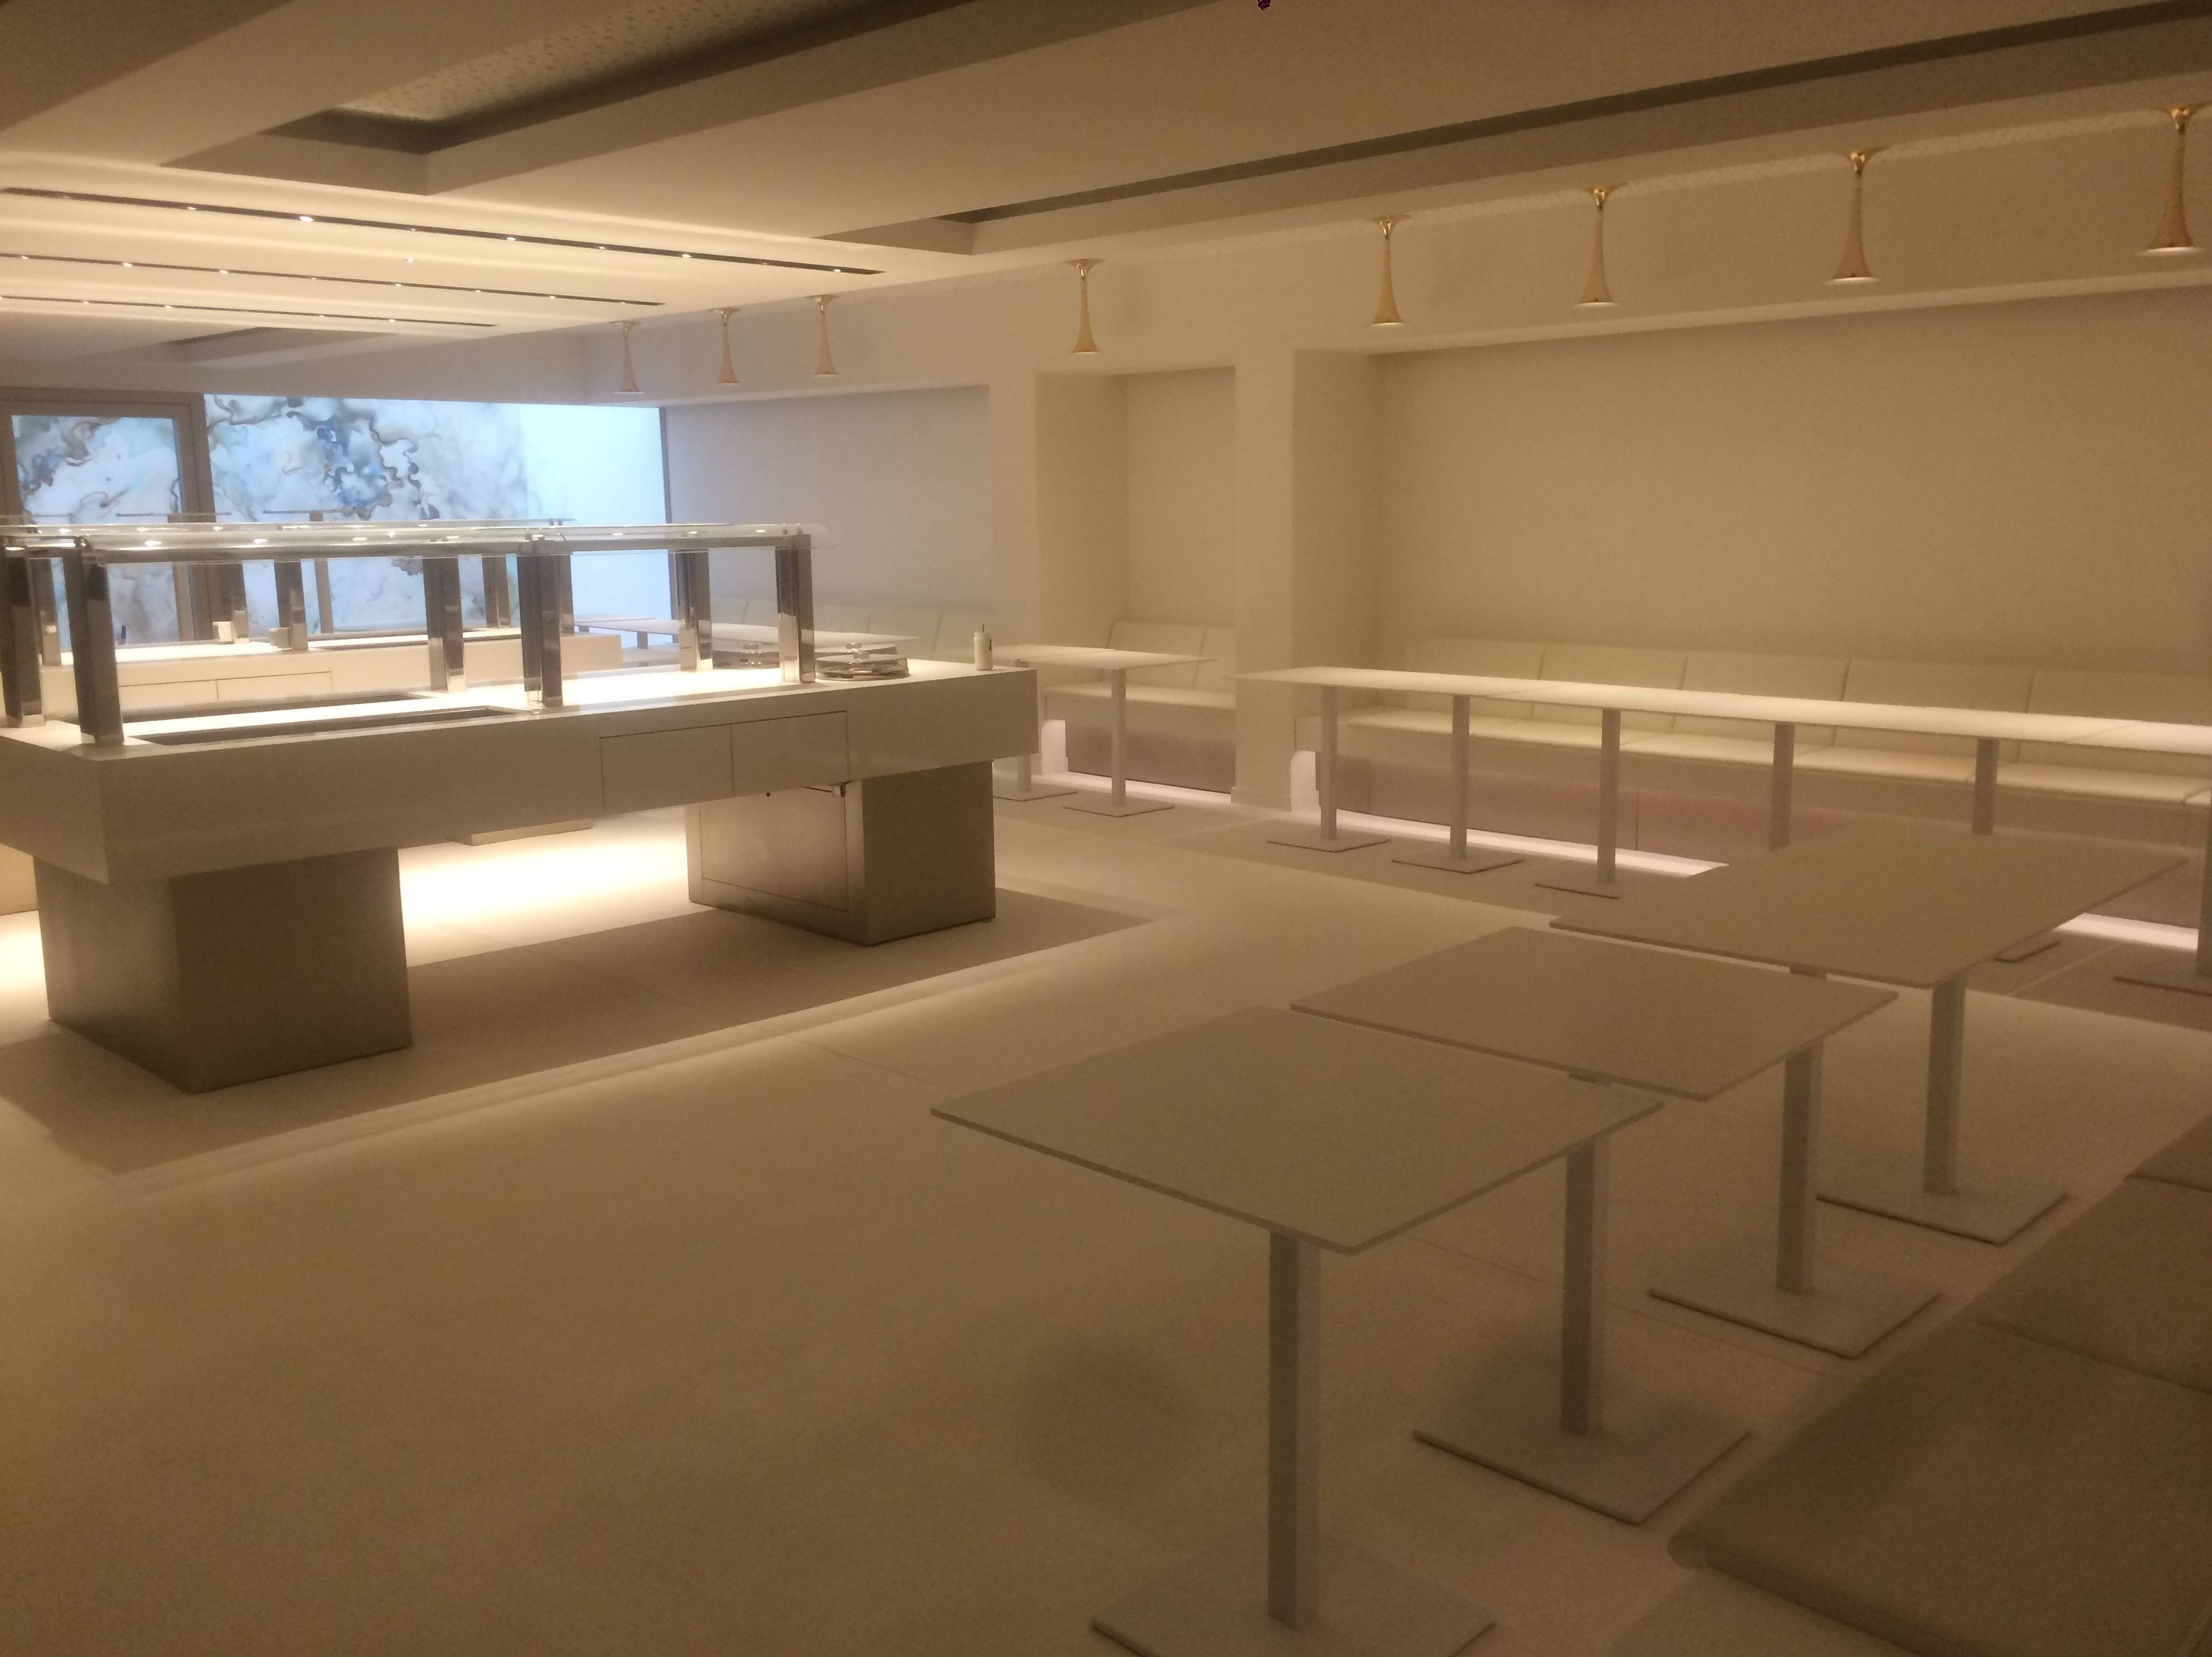 Fabricaci n hotel archimobel interiorismo a medida for A medida interiorismo